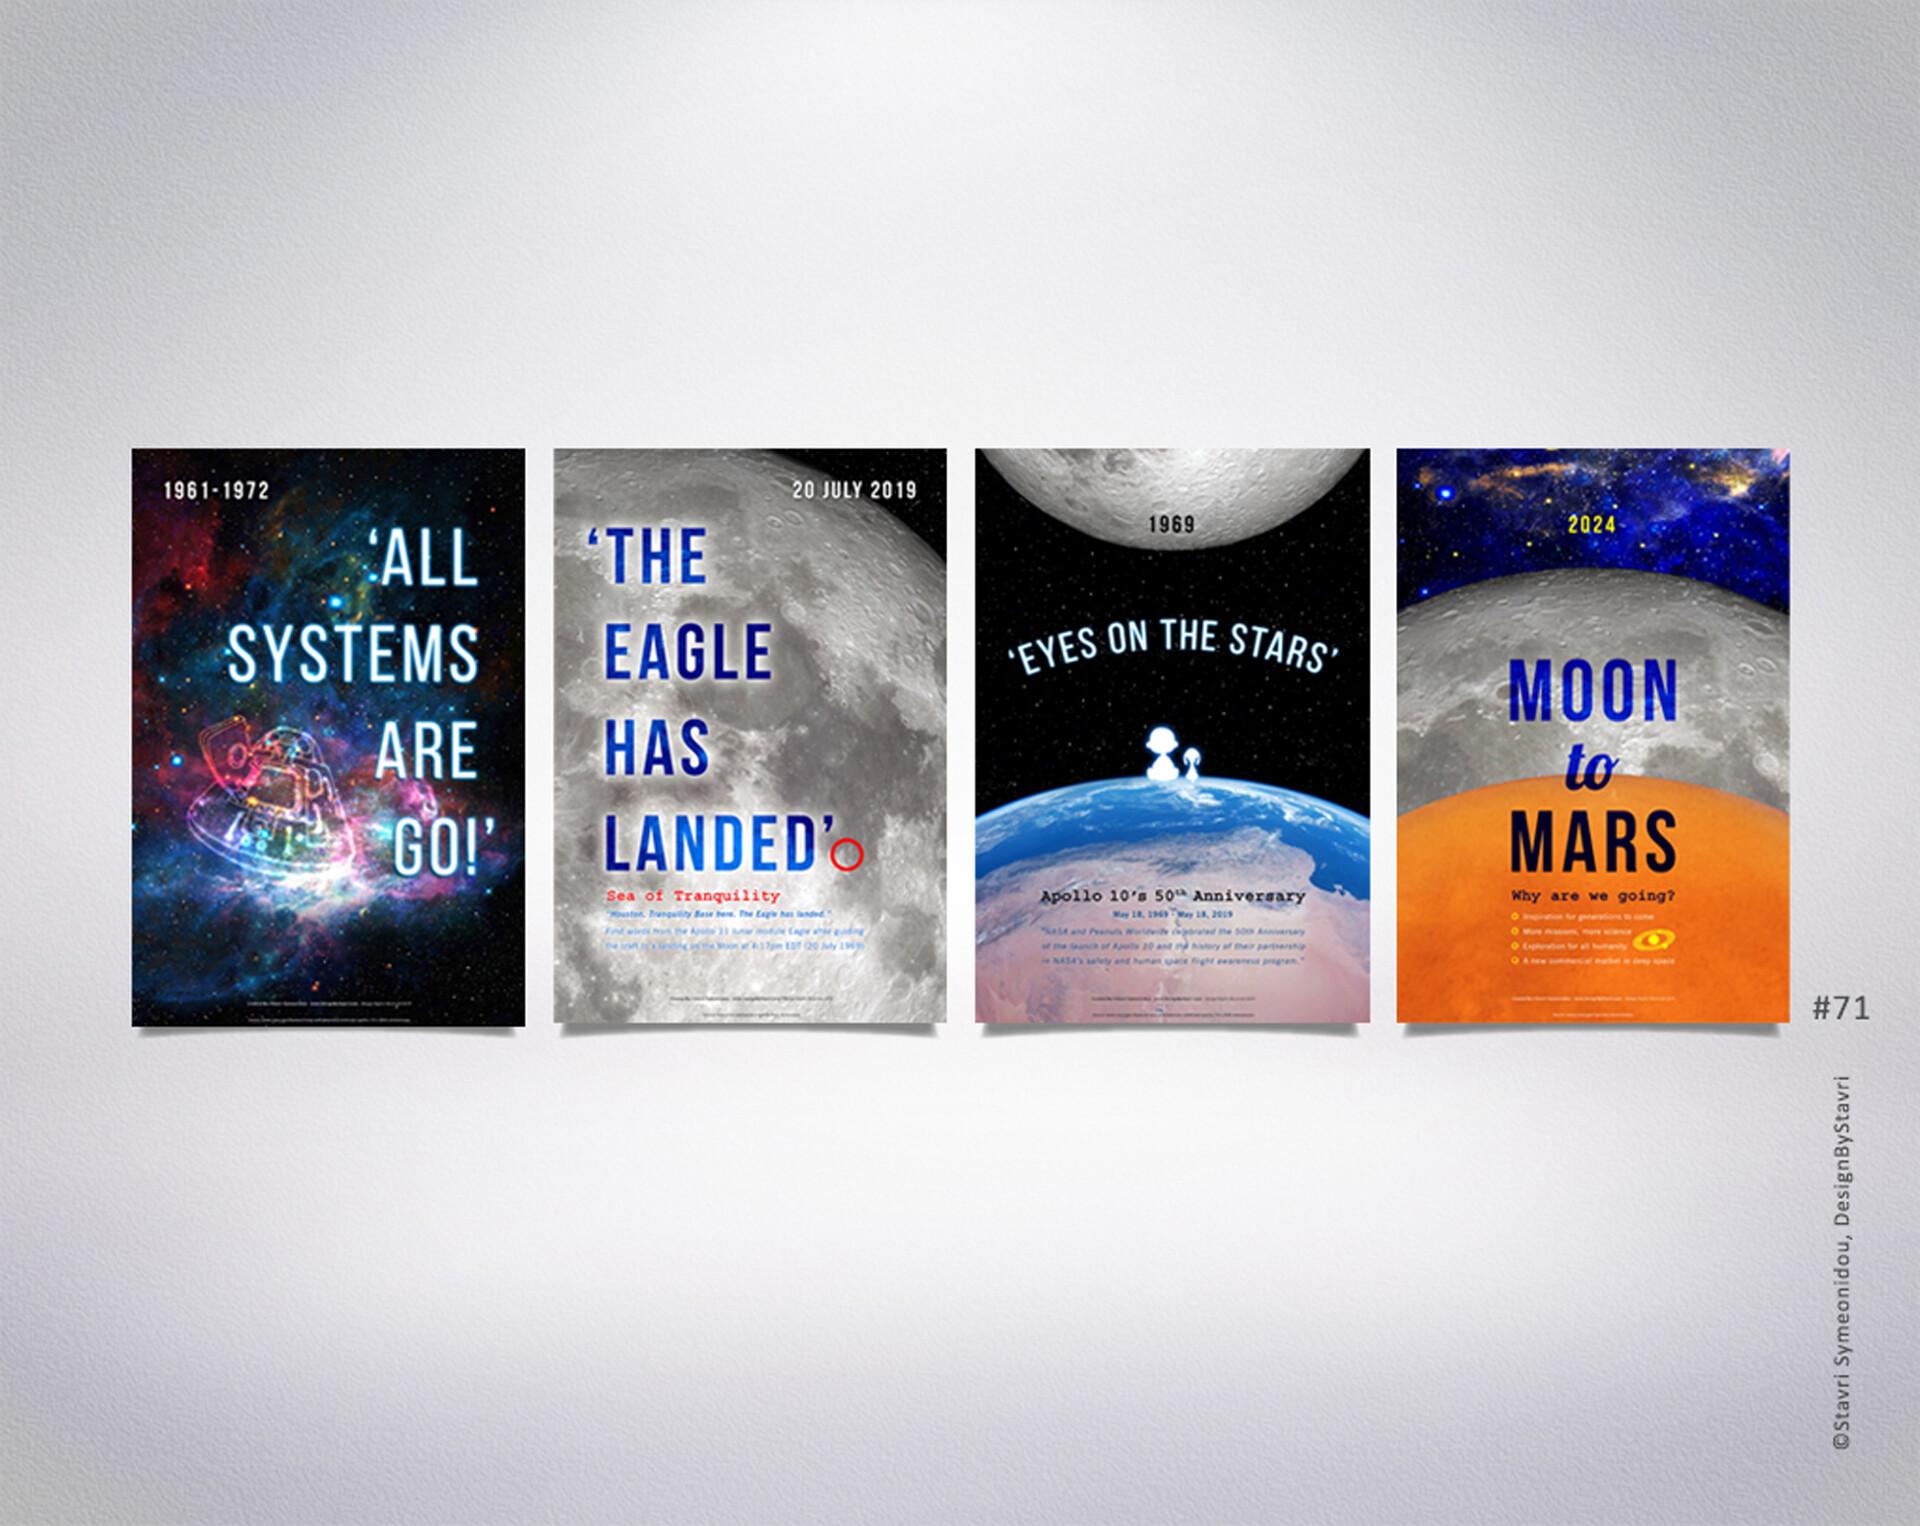 Stavri Symeonidou - SPACE EXPLORATION: Past and Future